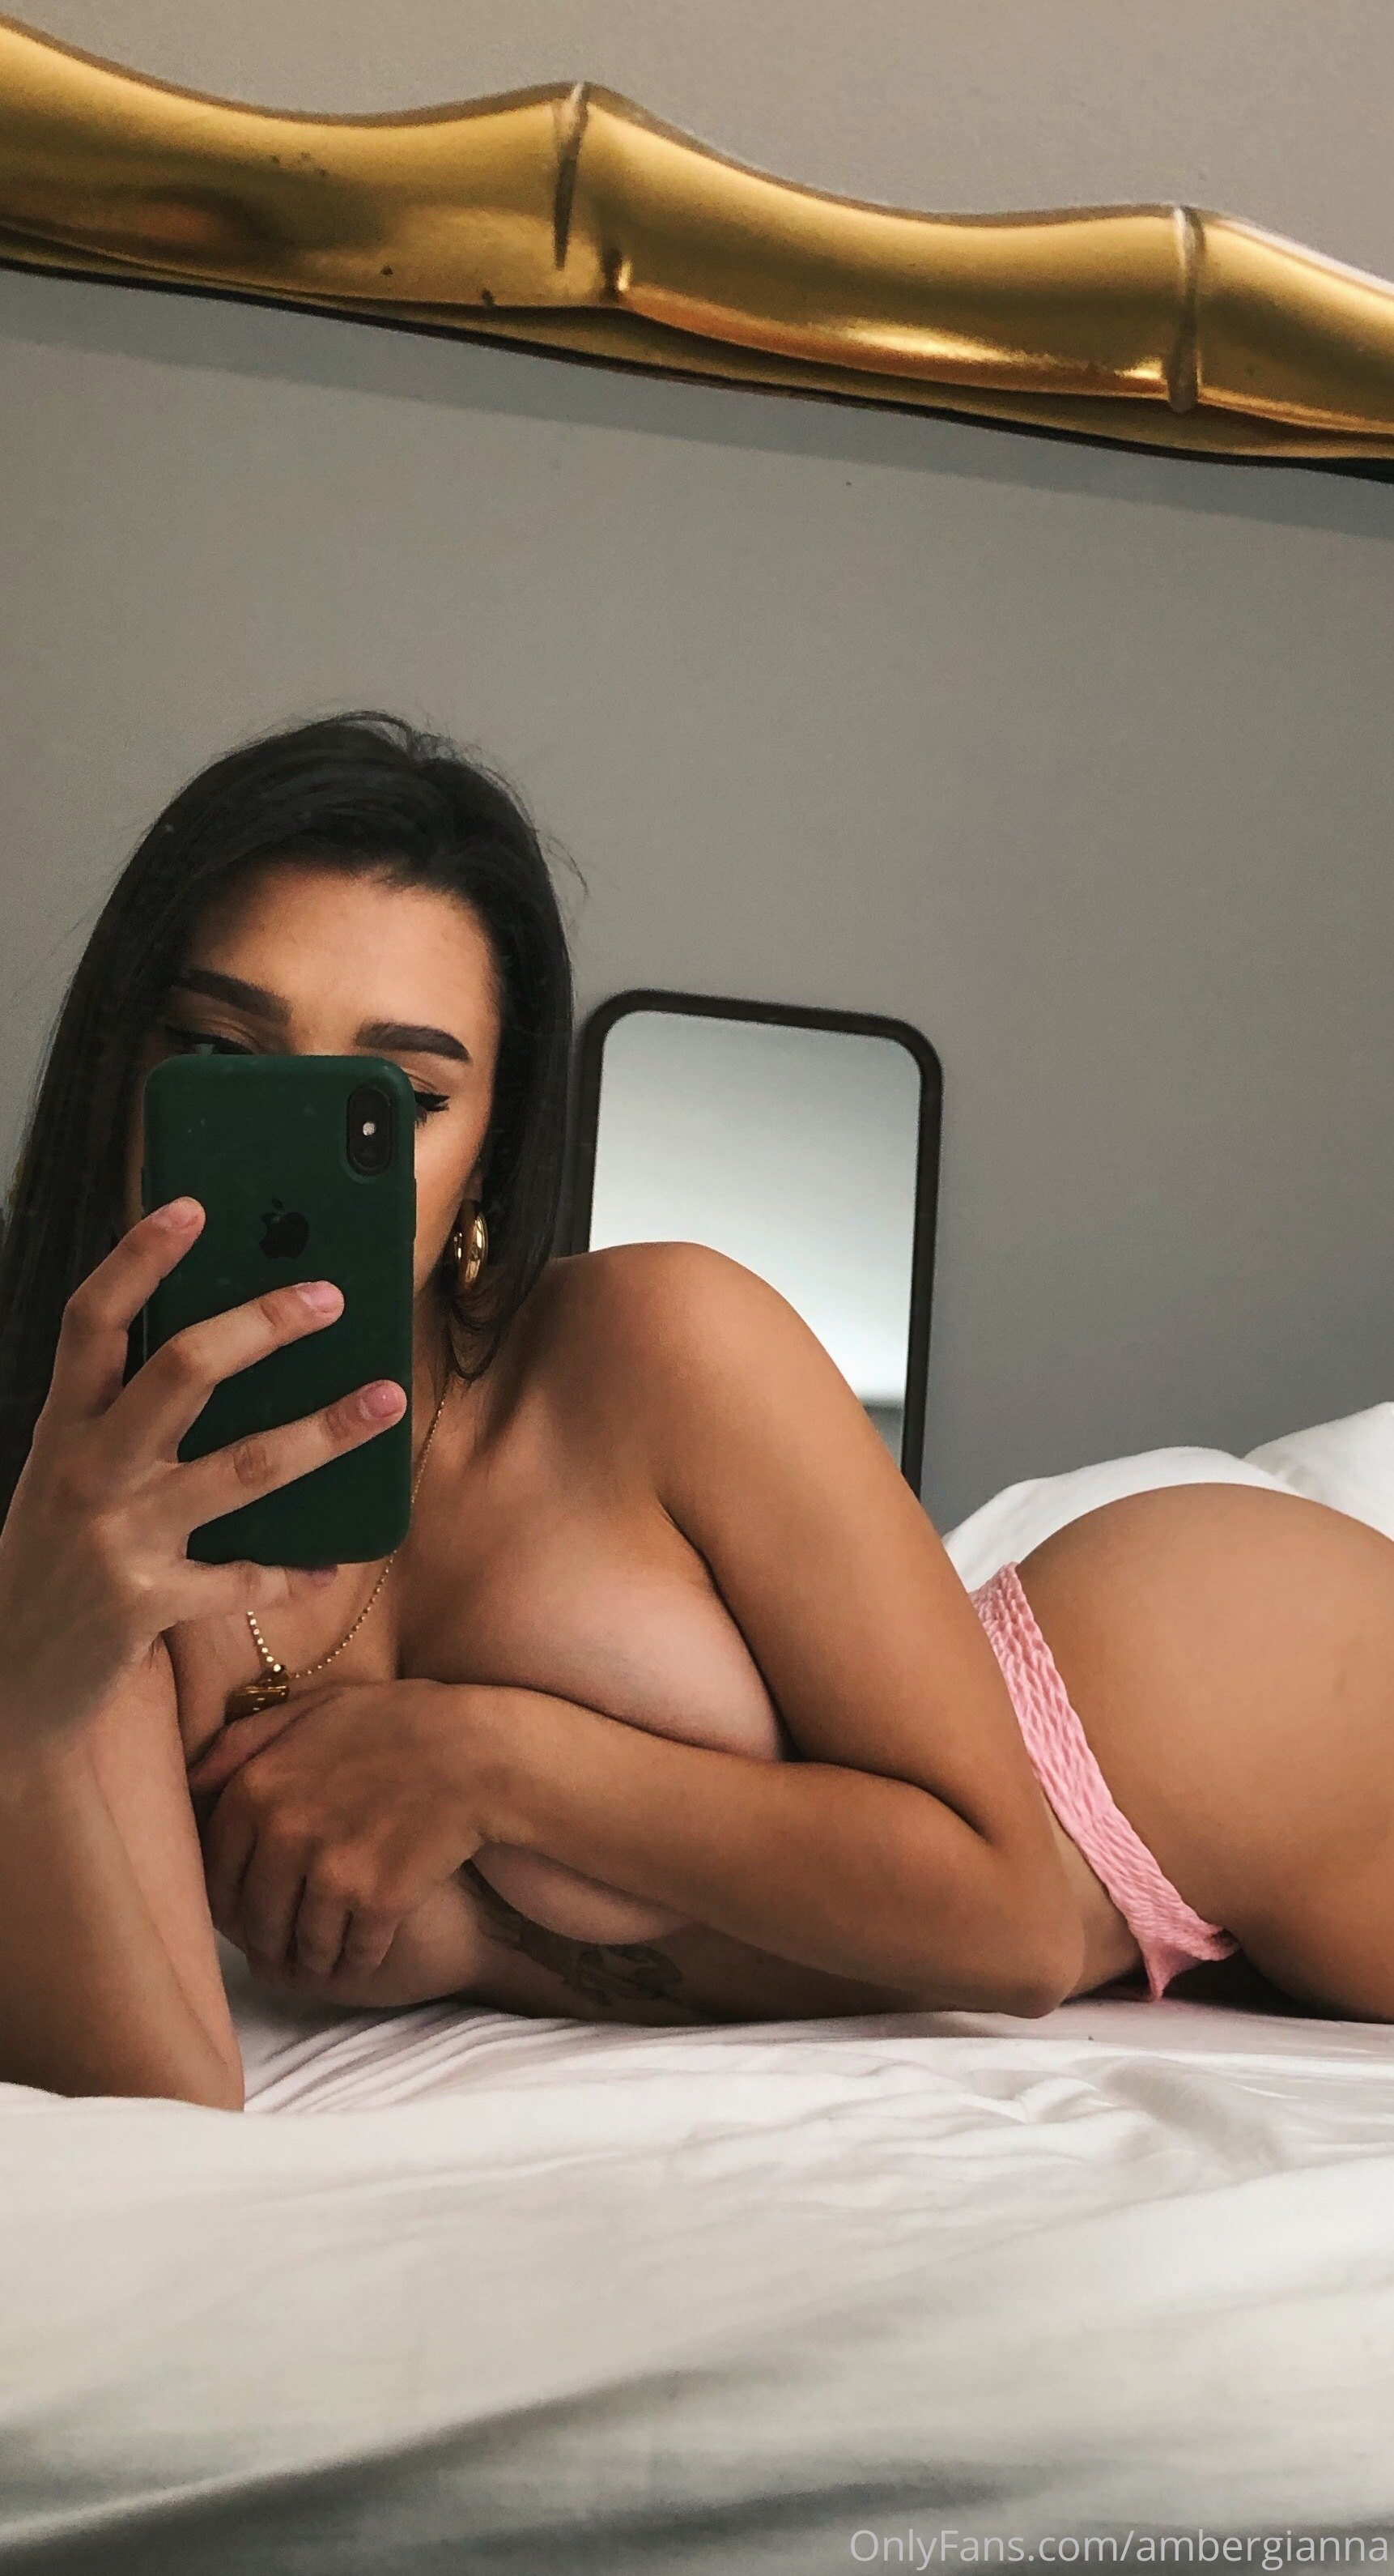 Amber Gianna Leaked 0100